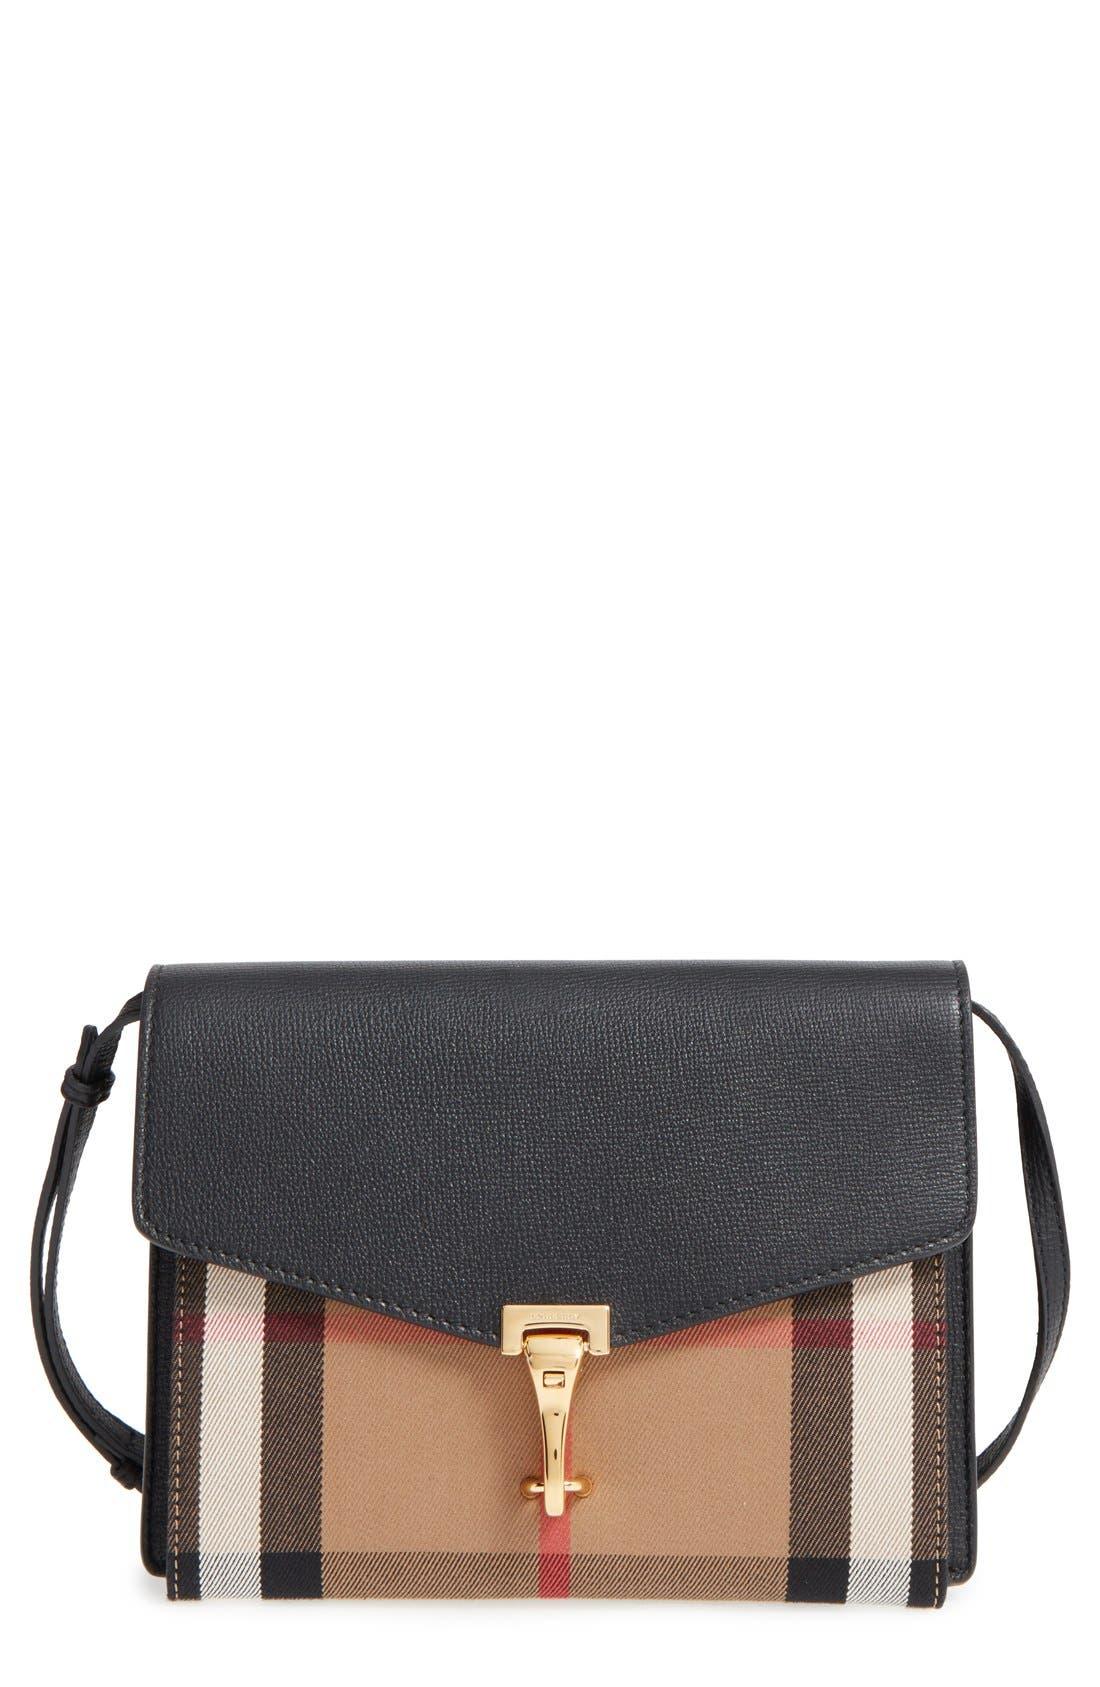 'Small Macken' House Check Crossbody Bag,                         Main,                         color, BLACK